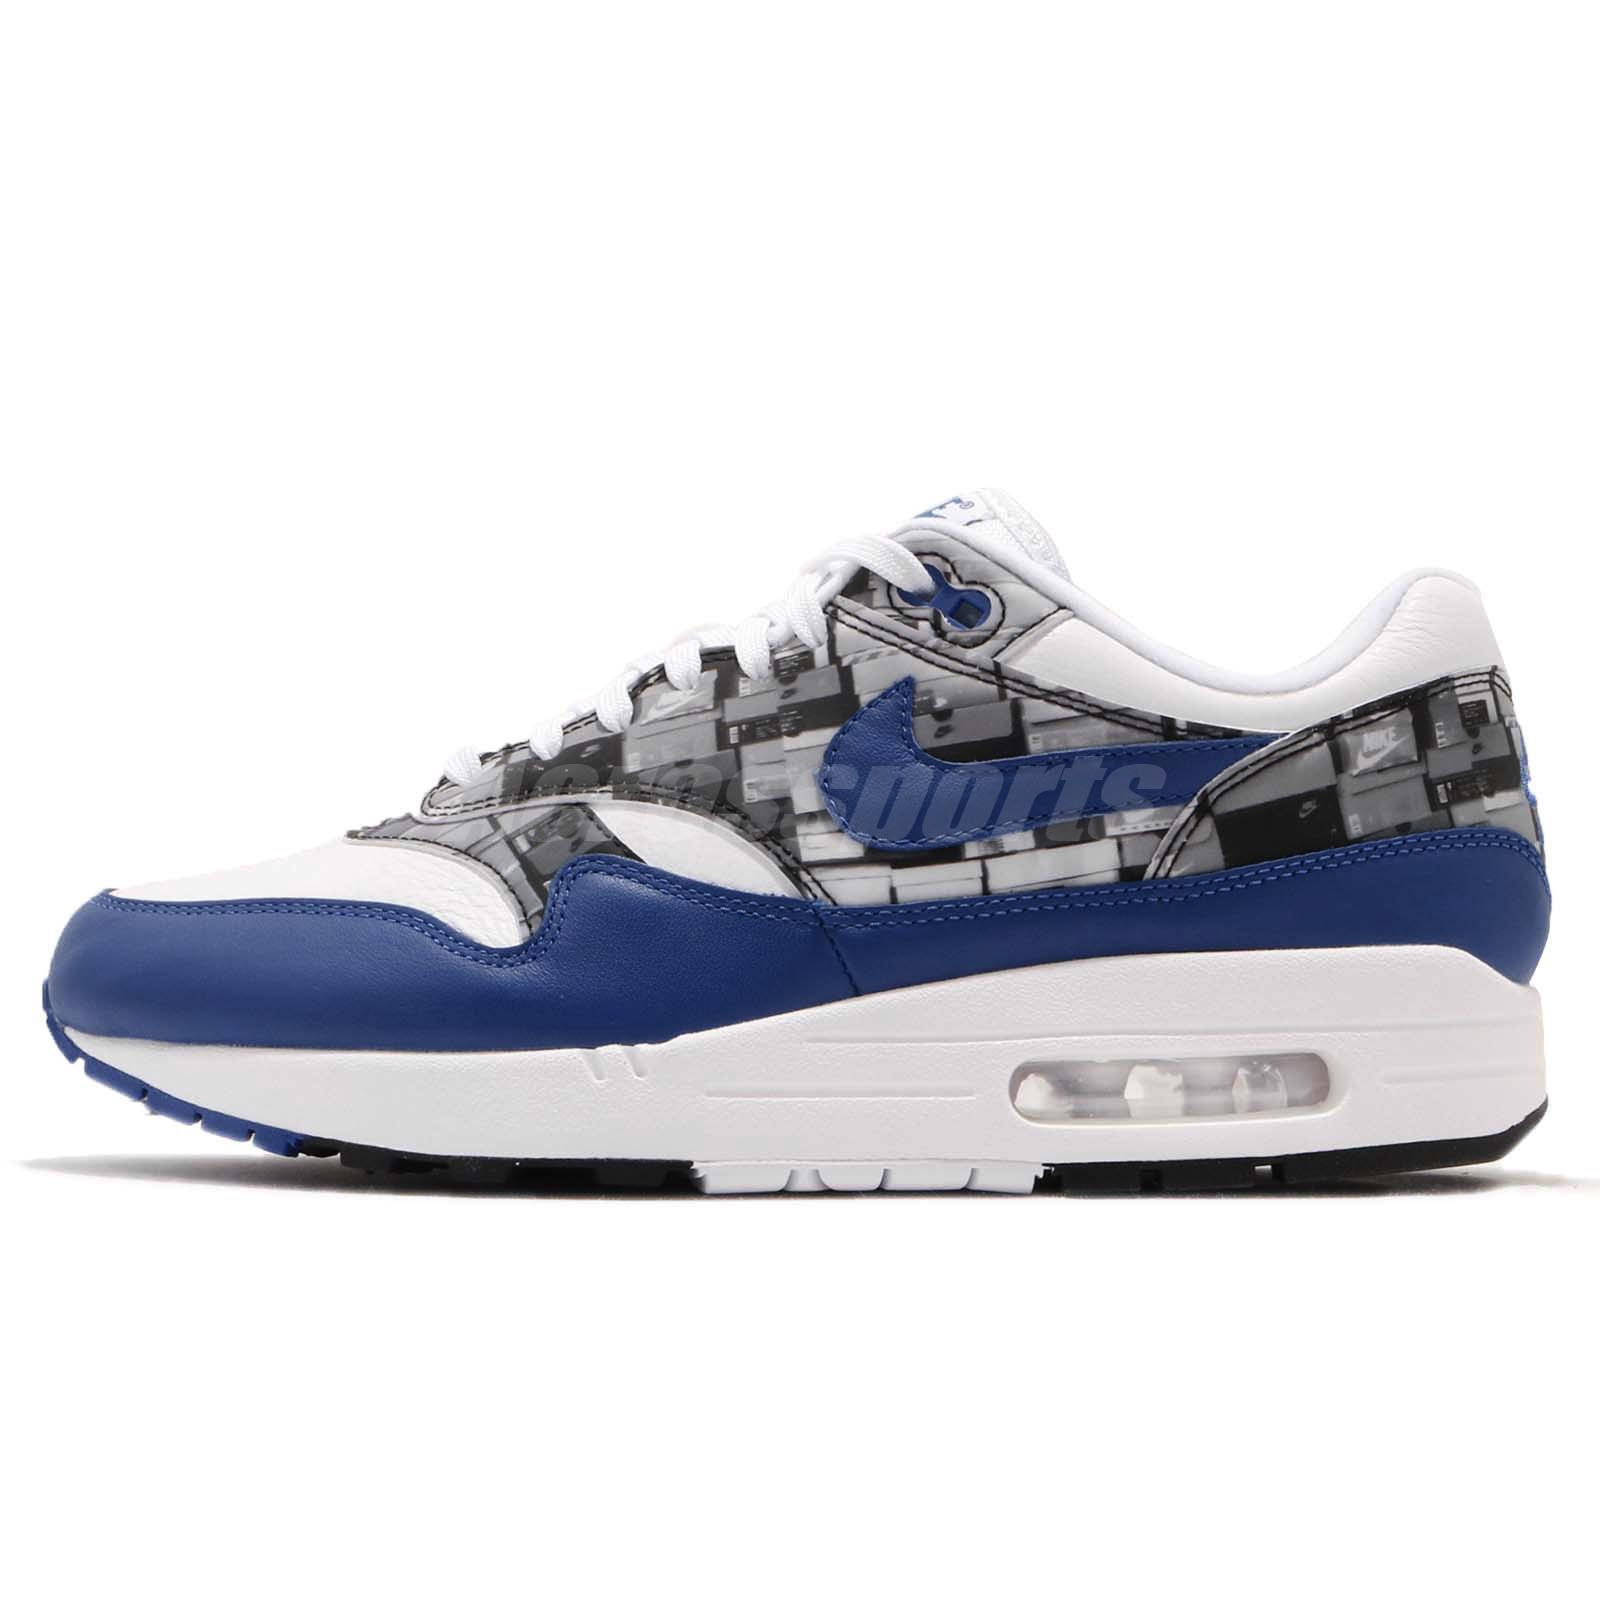 f38d80f324373f Atmos X Nike Air Max 1 Print We Love Nike White Blue Royal Mens Shoes AQ0927 -100